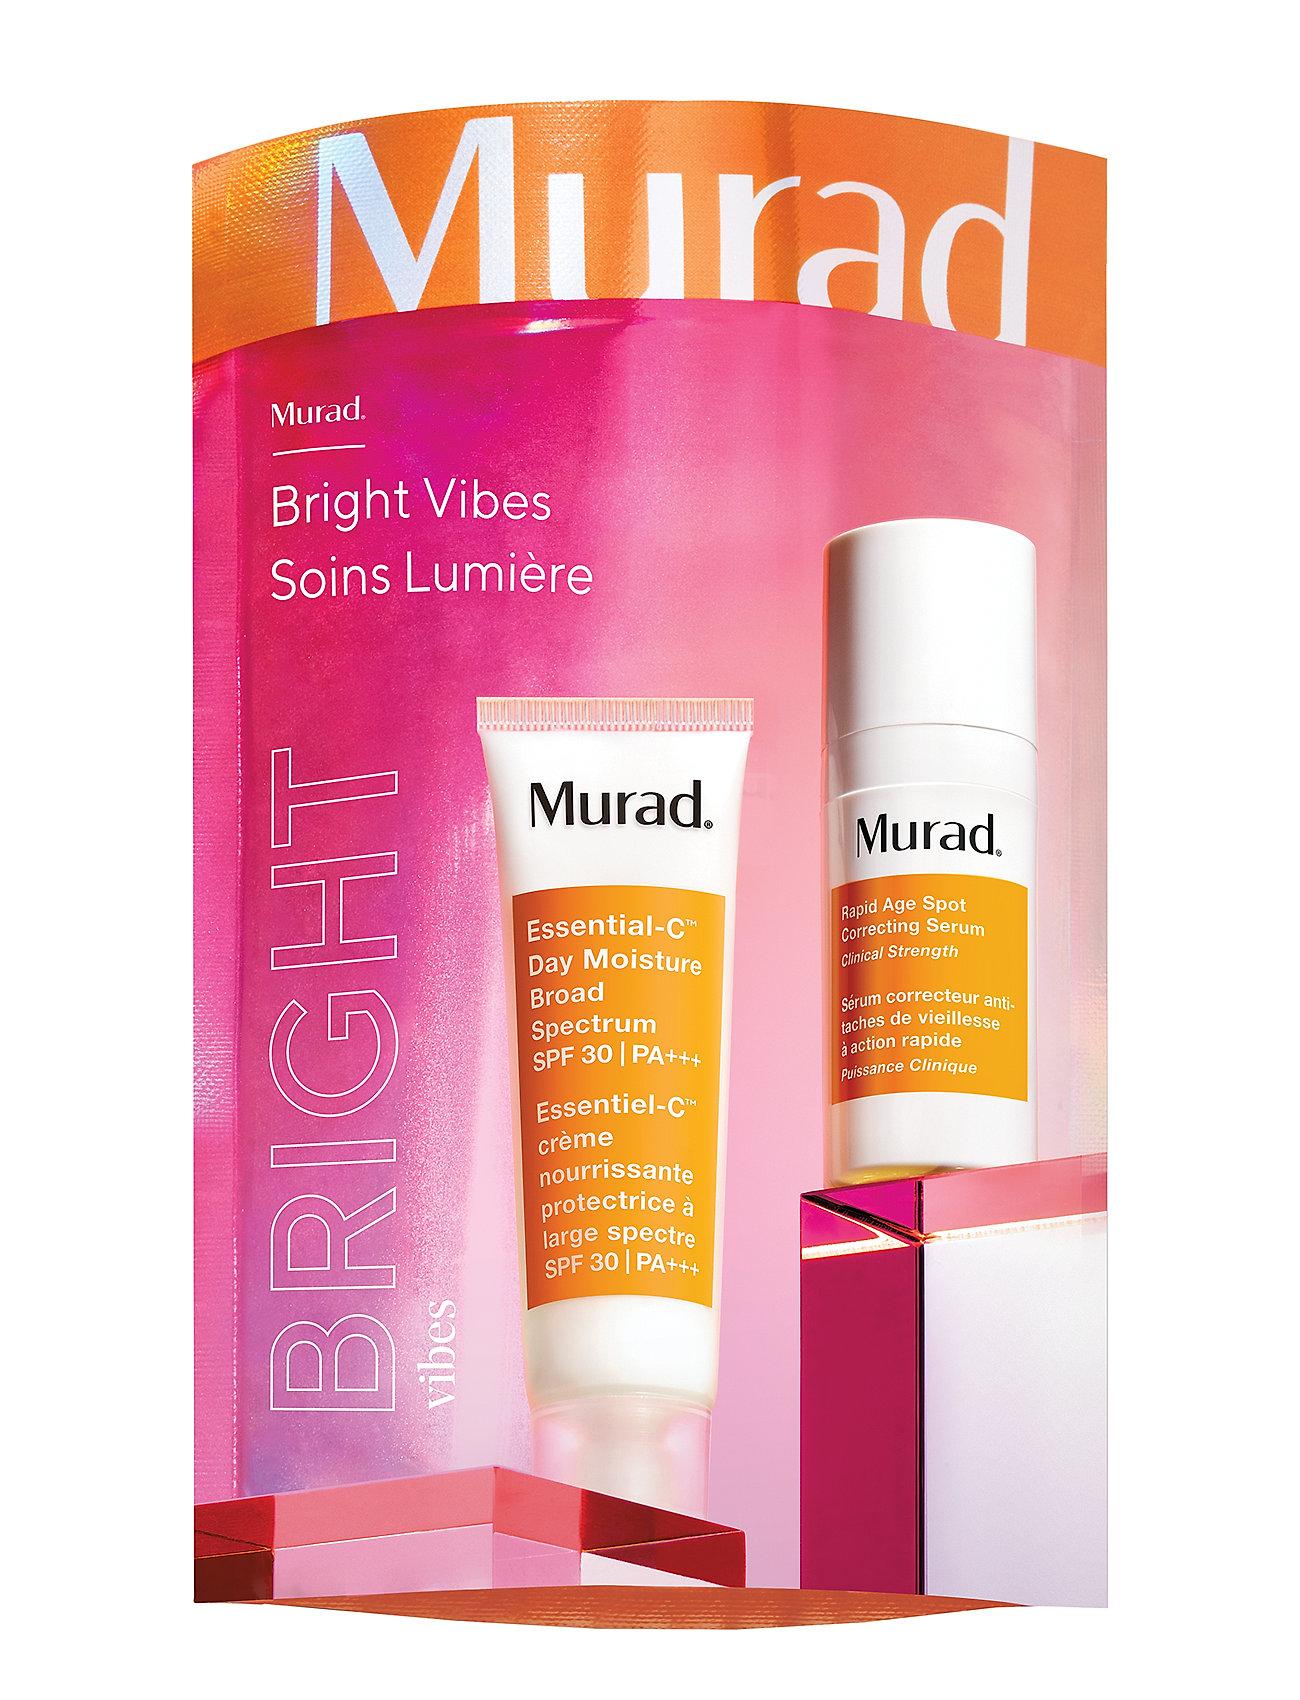 Murad BRIGHT VIBES TRAVEL INTL - NO COLOUR